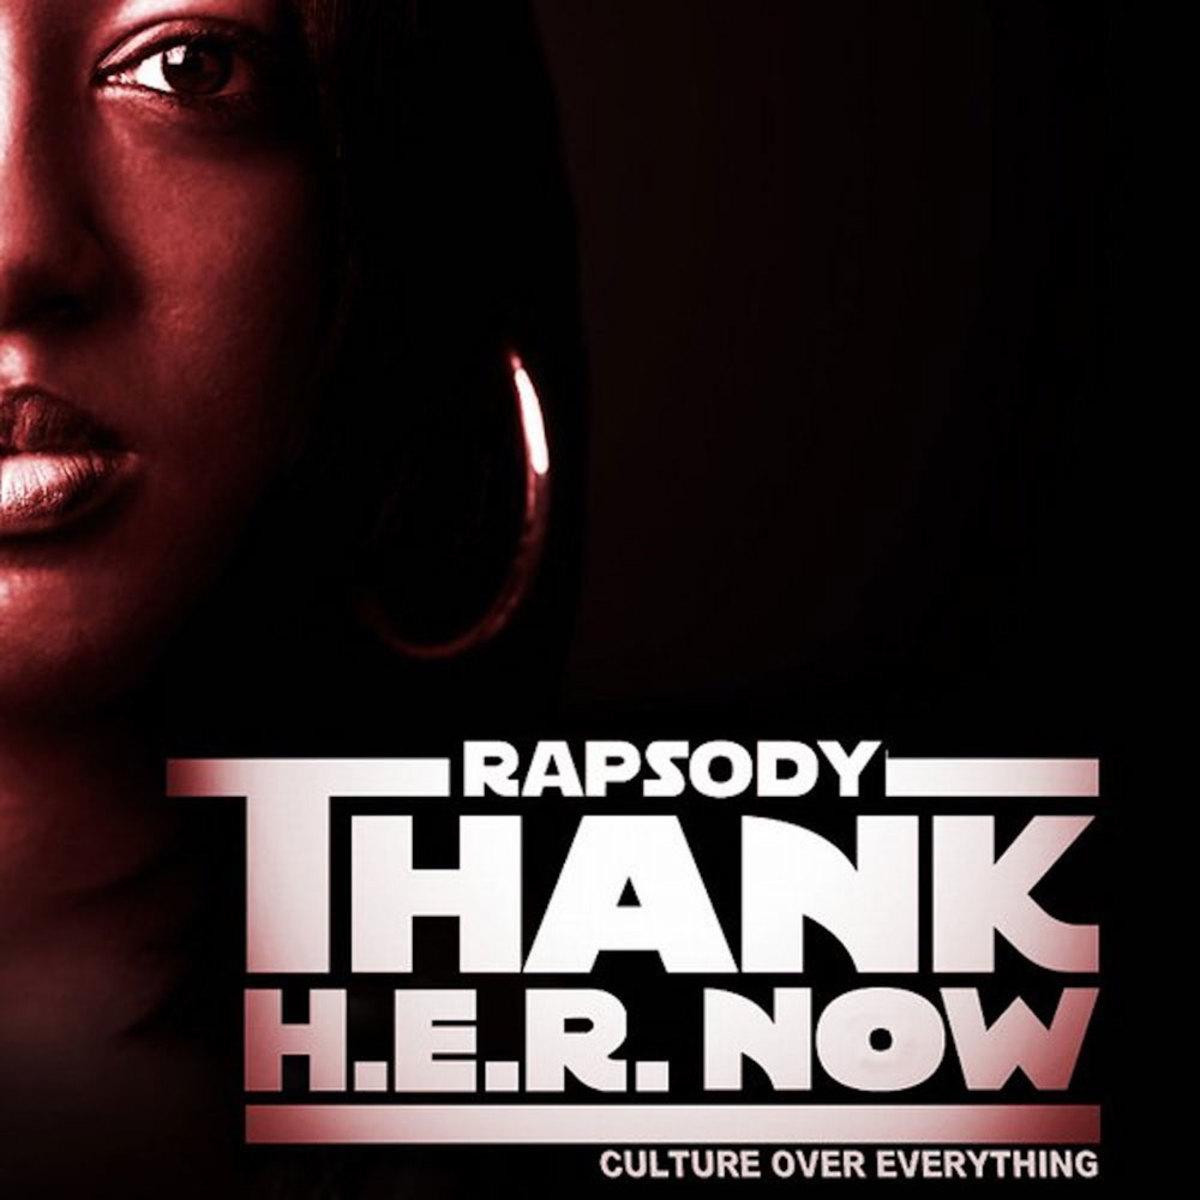 rapsody-thank-her-now